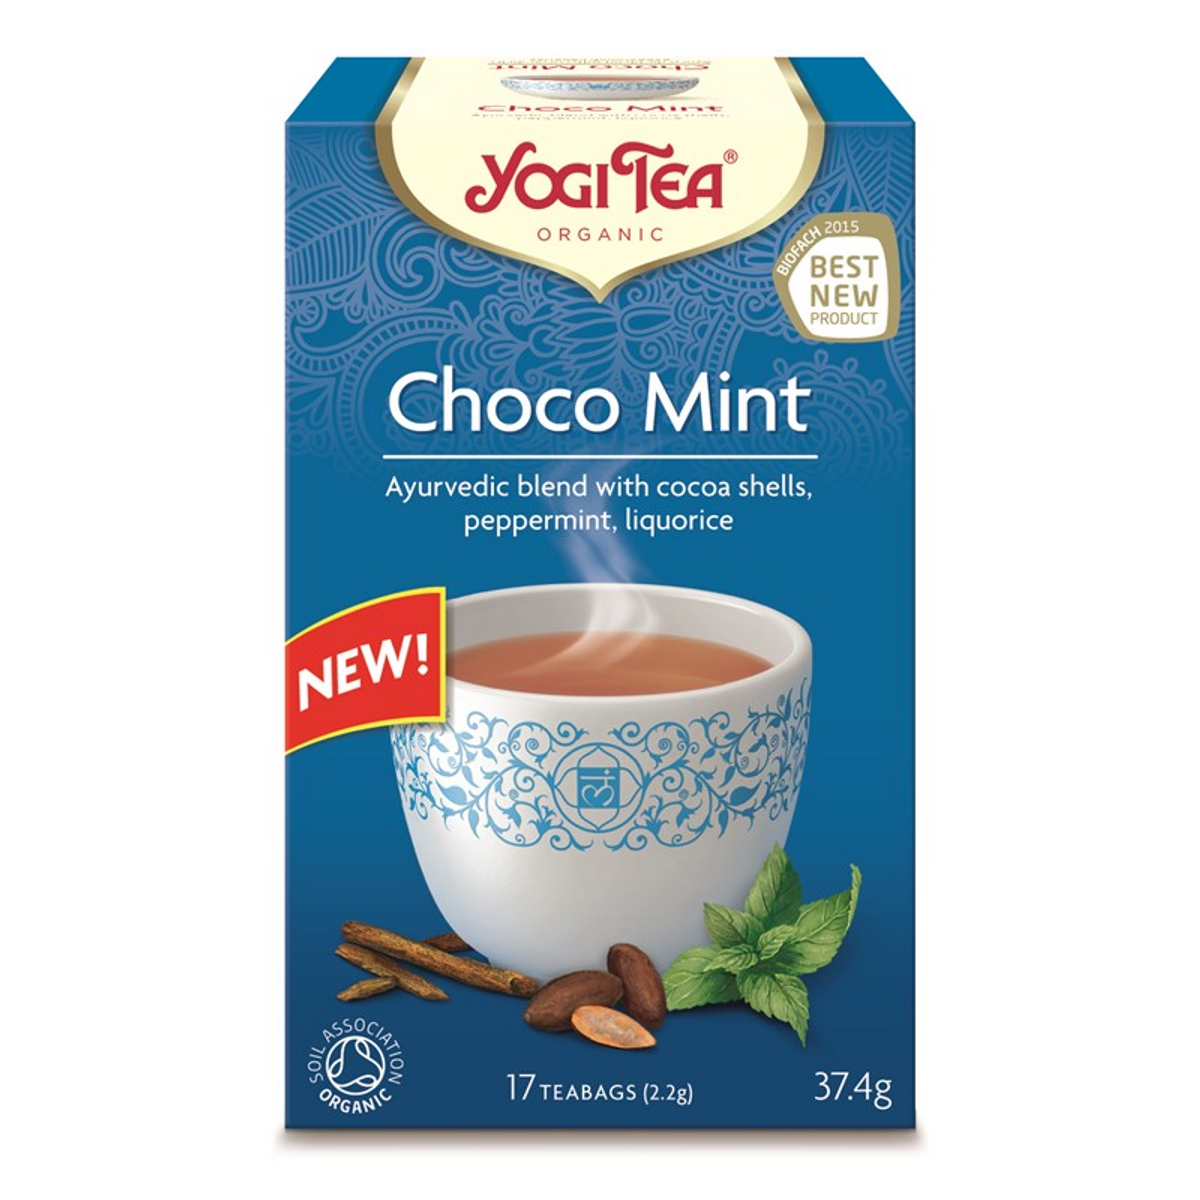 Yogi Tea Choco Mint, 17 teposer